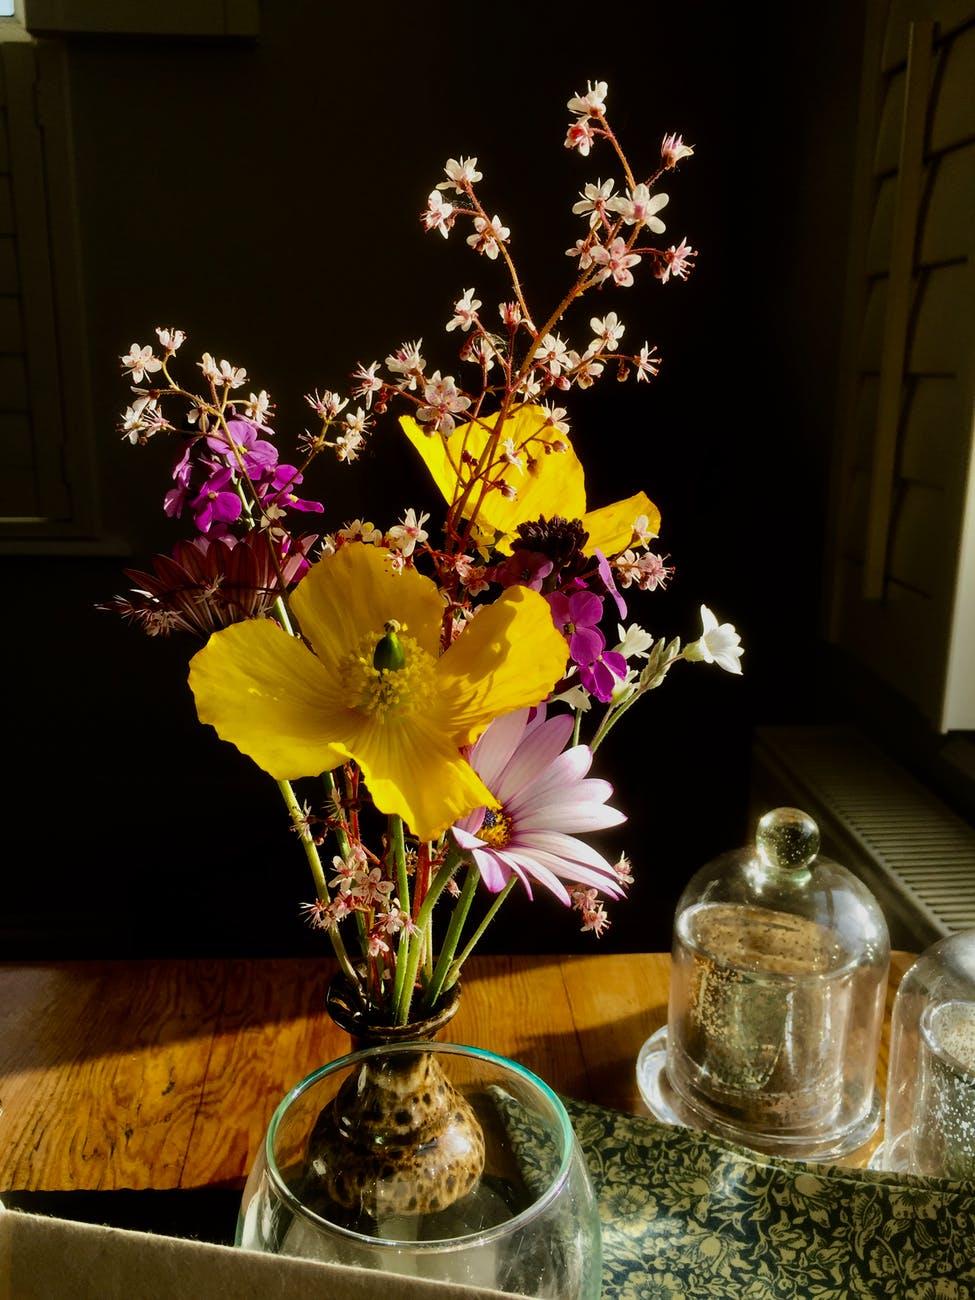 Upright style moribana - Ikebana art of flowers arrangement